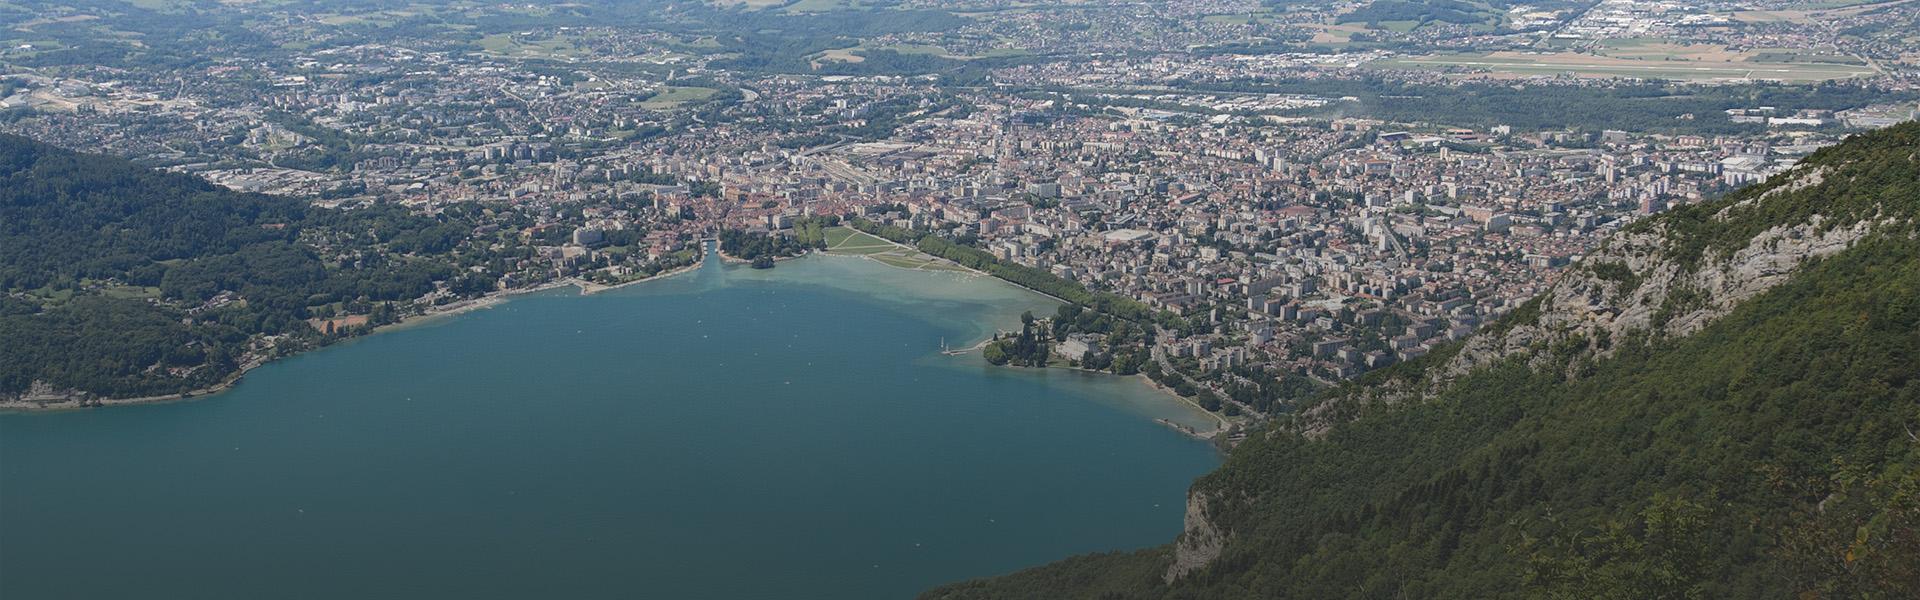 Louer un bureau à Annecy